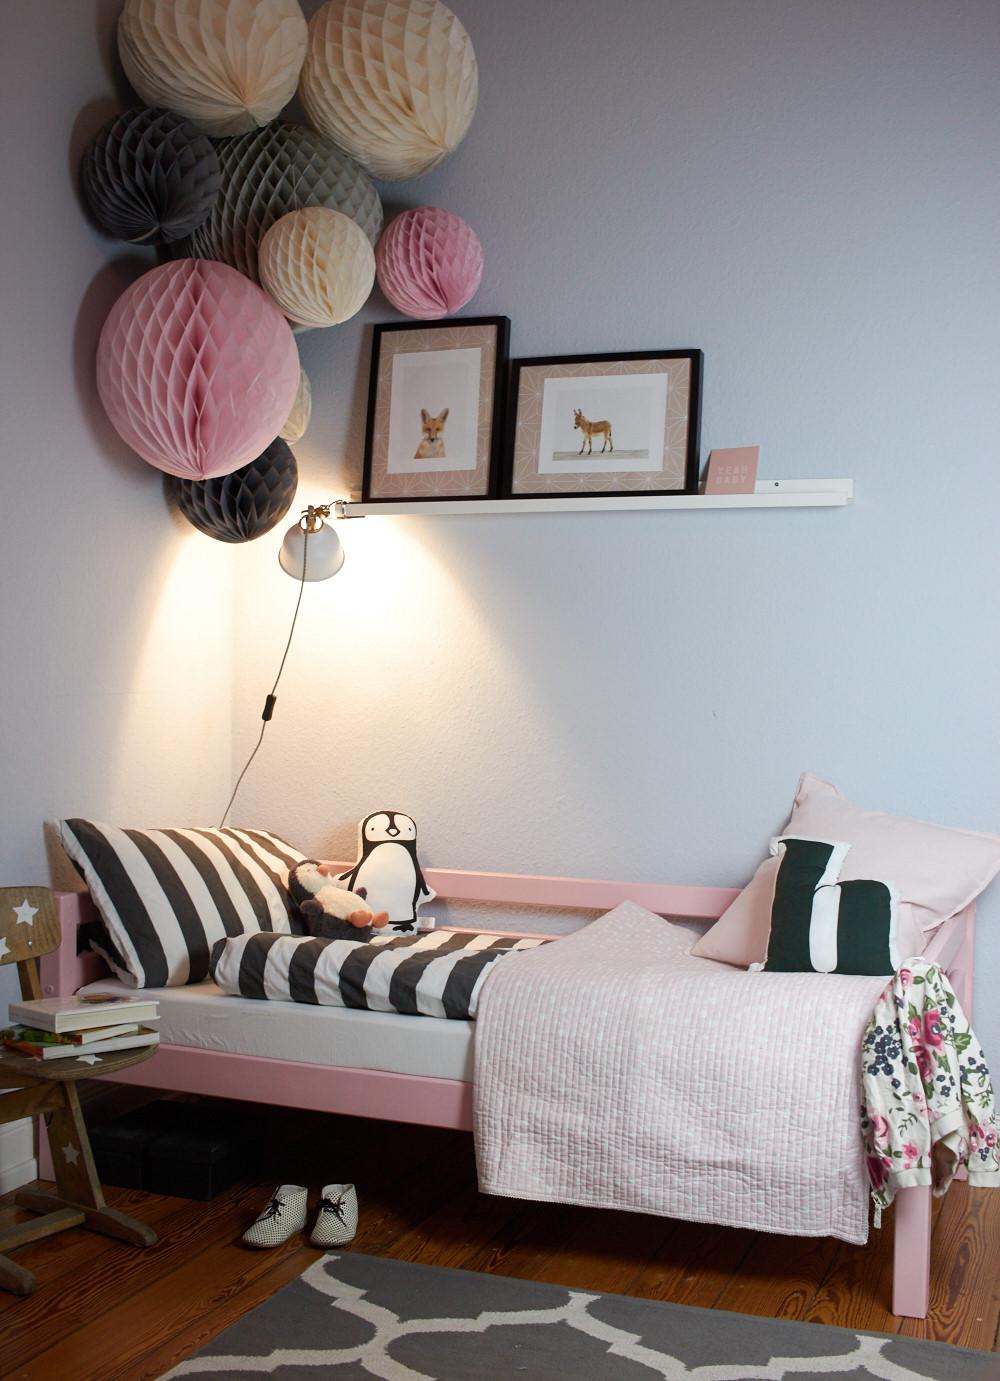 Kinderzimmerumgestaltung in Pantone Rose   tastesheriff